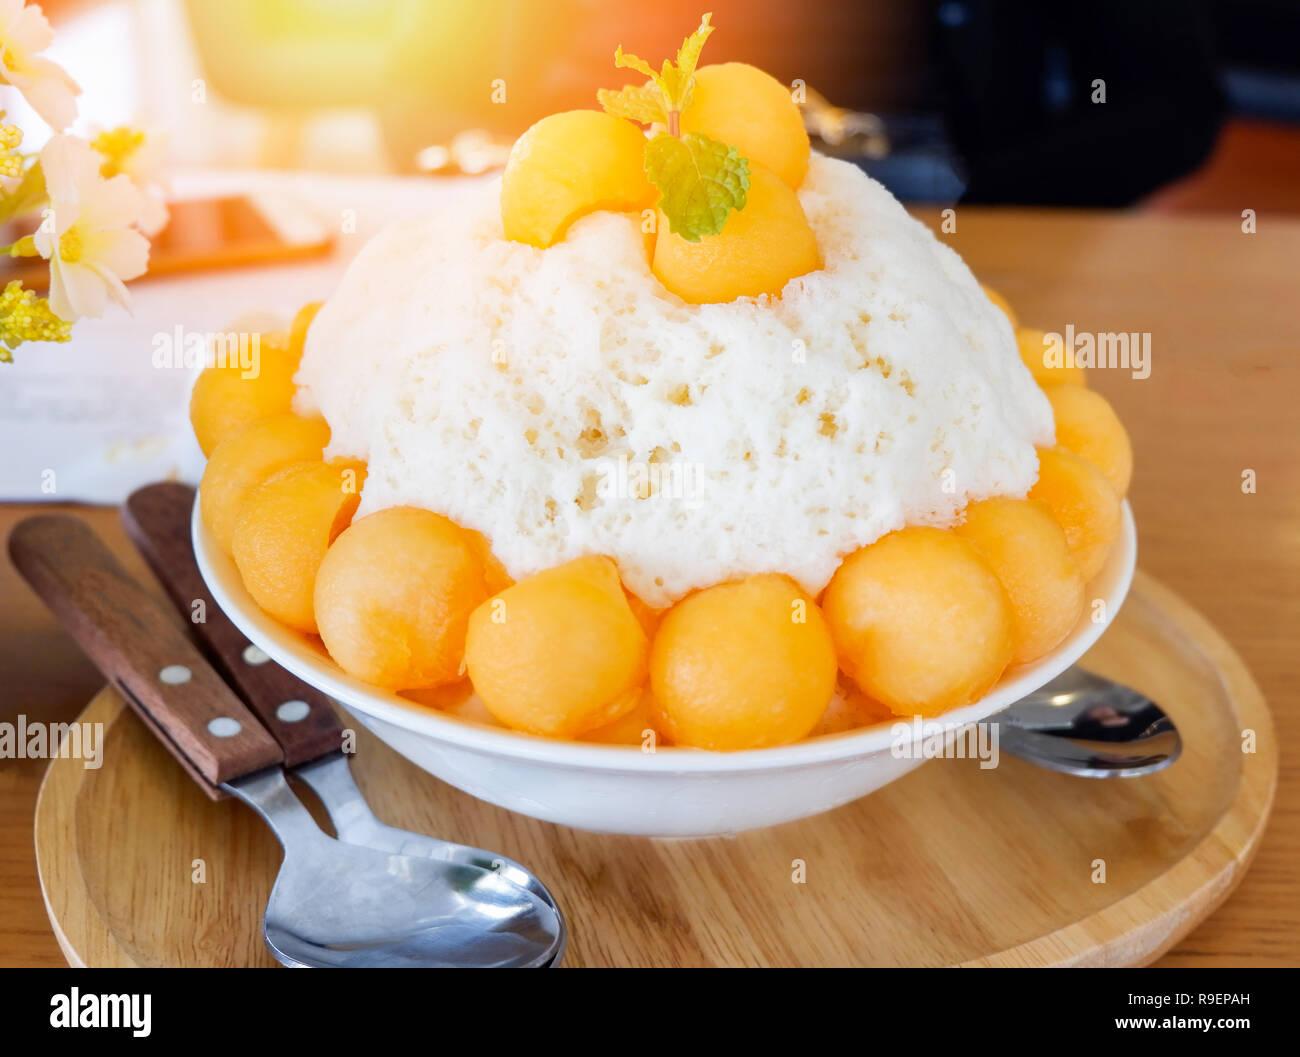 Bingsu Korea Dessert Style Bingsu Kantalupe Bingsoo Fach Auf Holz